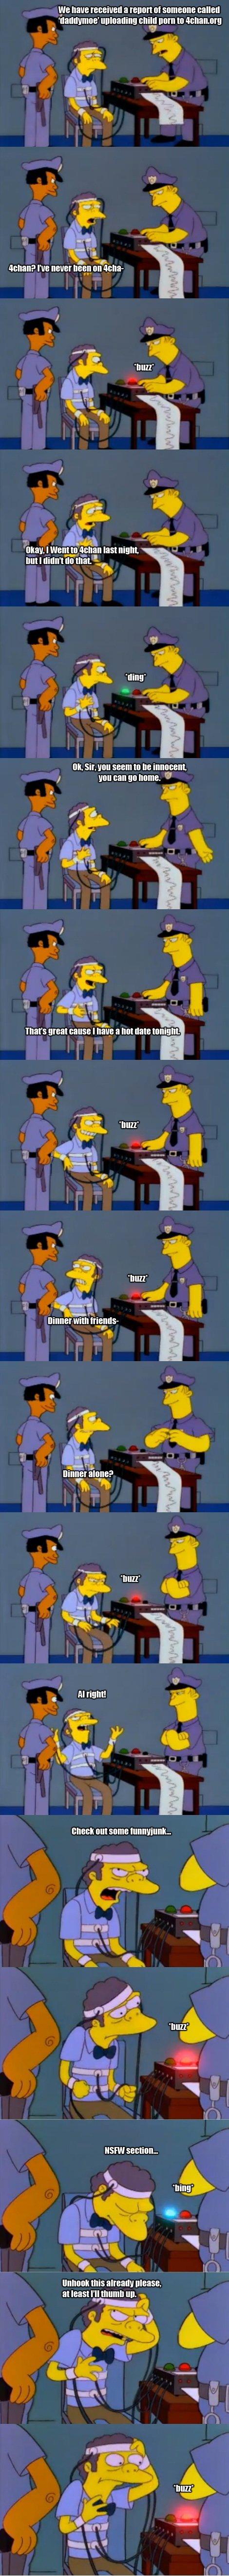 Moe. oh that Moe syzlak.. repost Moe fourchan